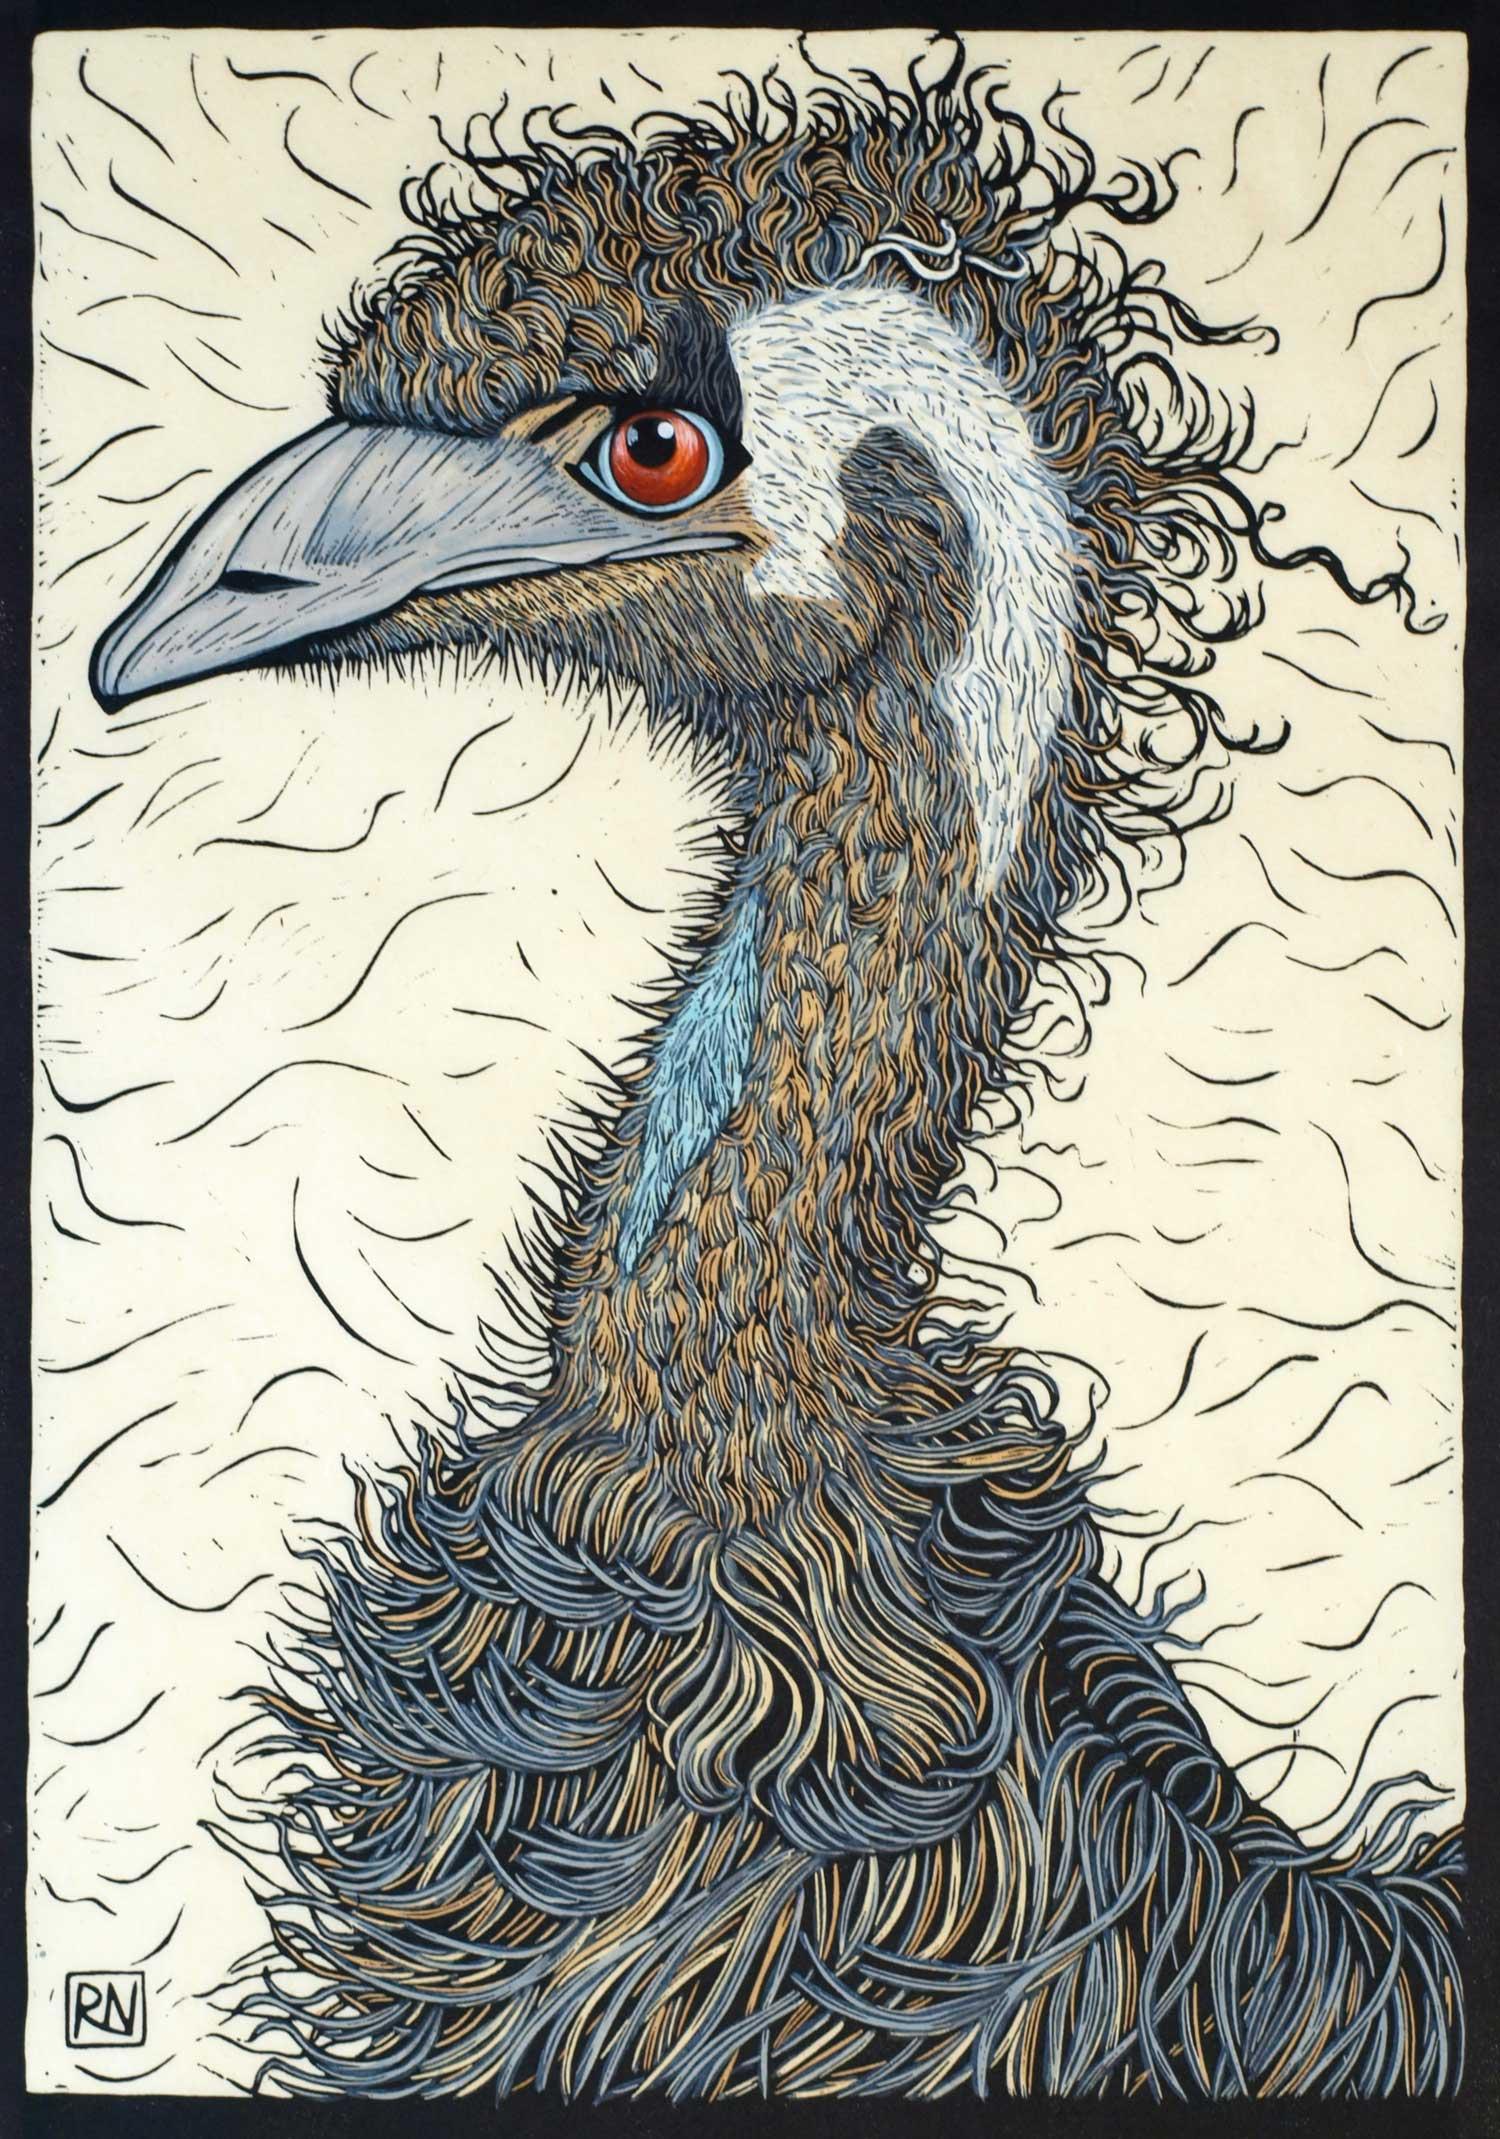 EMU  49 X 34 CM EDITION OF 50  HAND COLOURED LINOCUT ON HANDMADE JAPANESE PAPER  $1,100